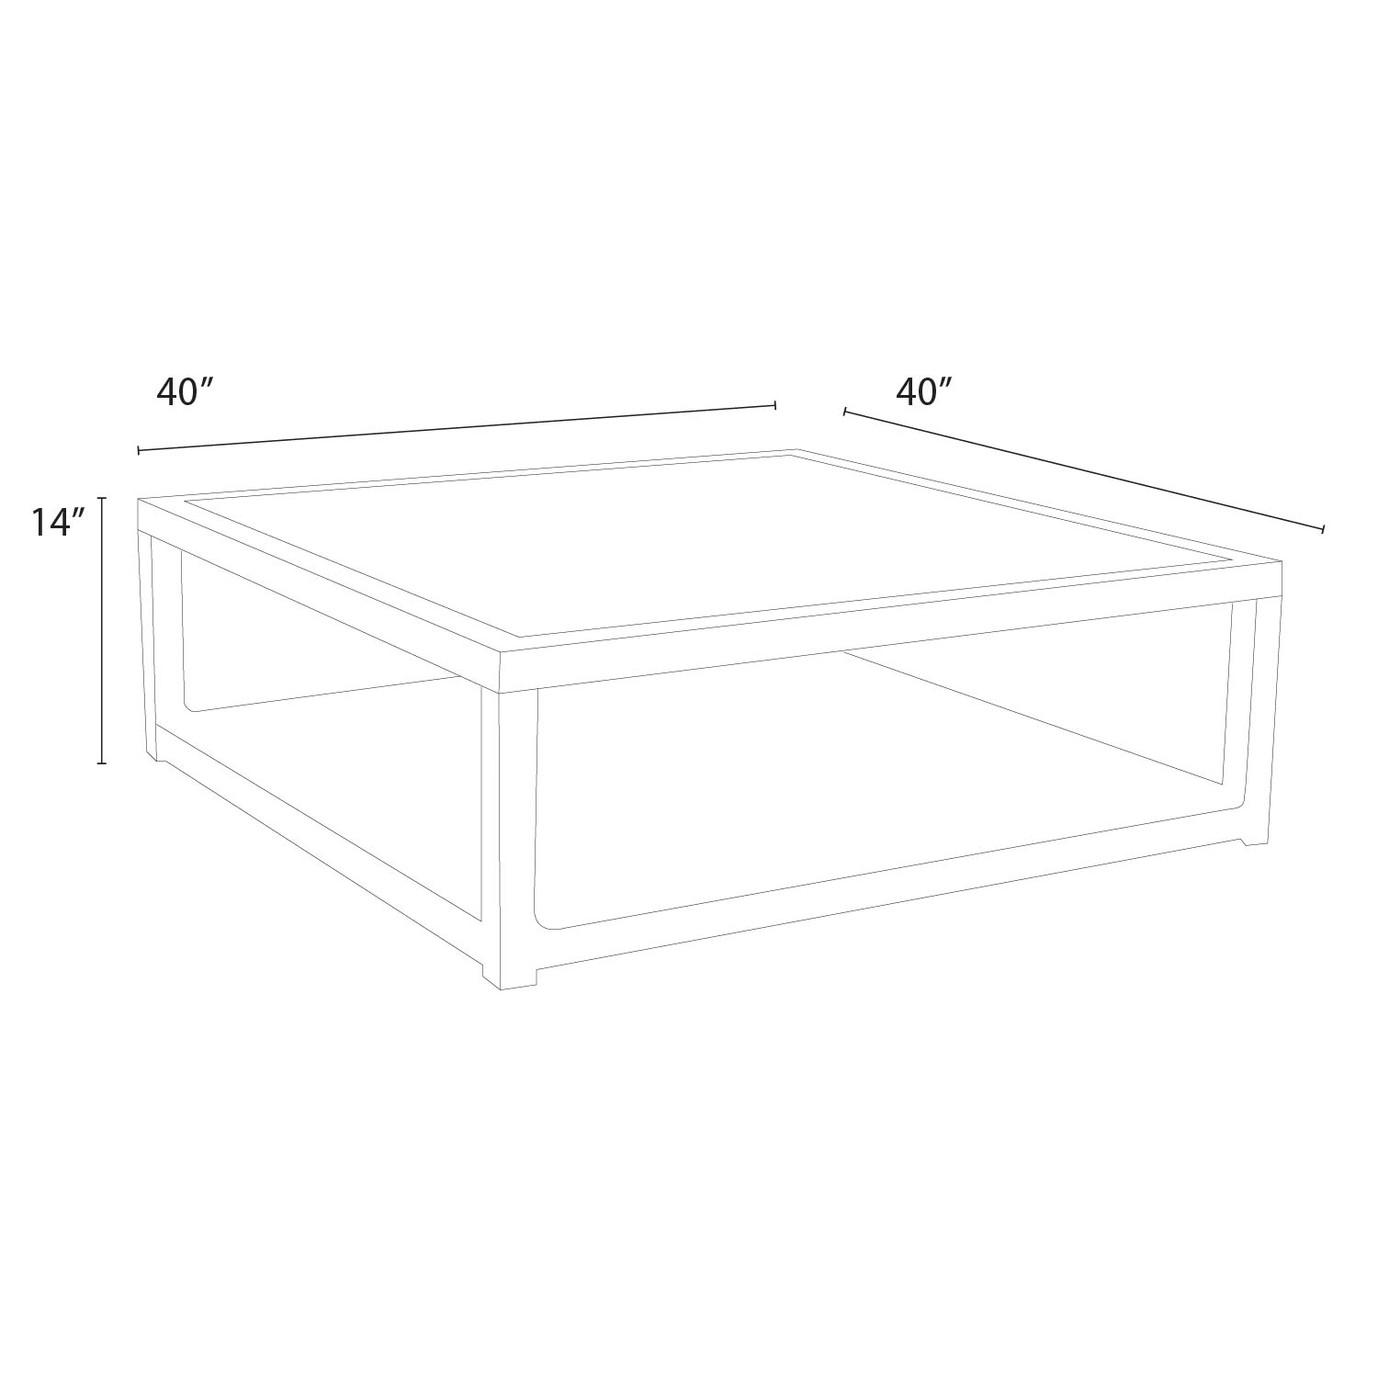 Portofino™ Comfort 40x40 Stone Top Conversation Table - Chalk